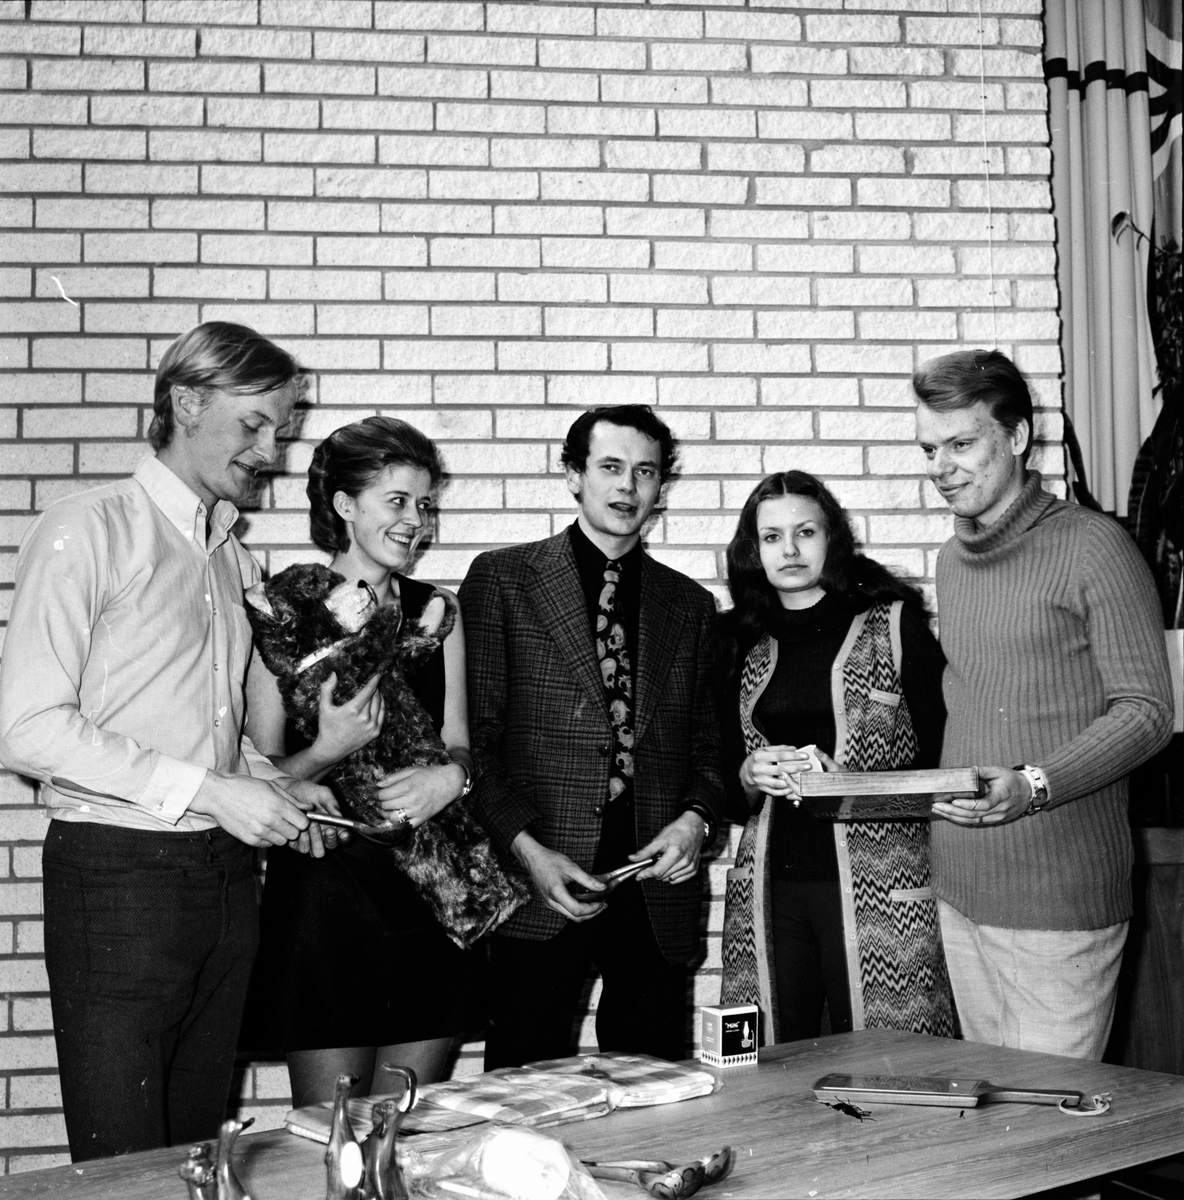 Arbrå, CUF-distriktsmöte, April 1971